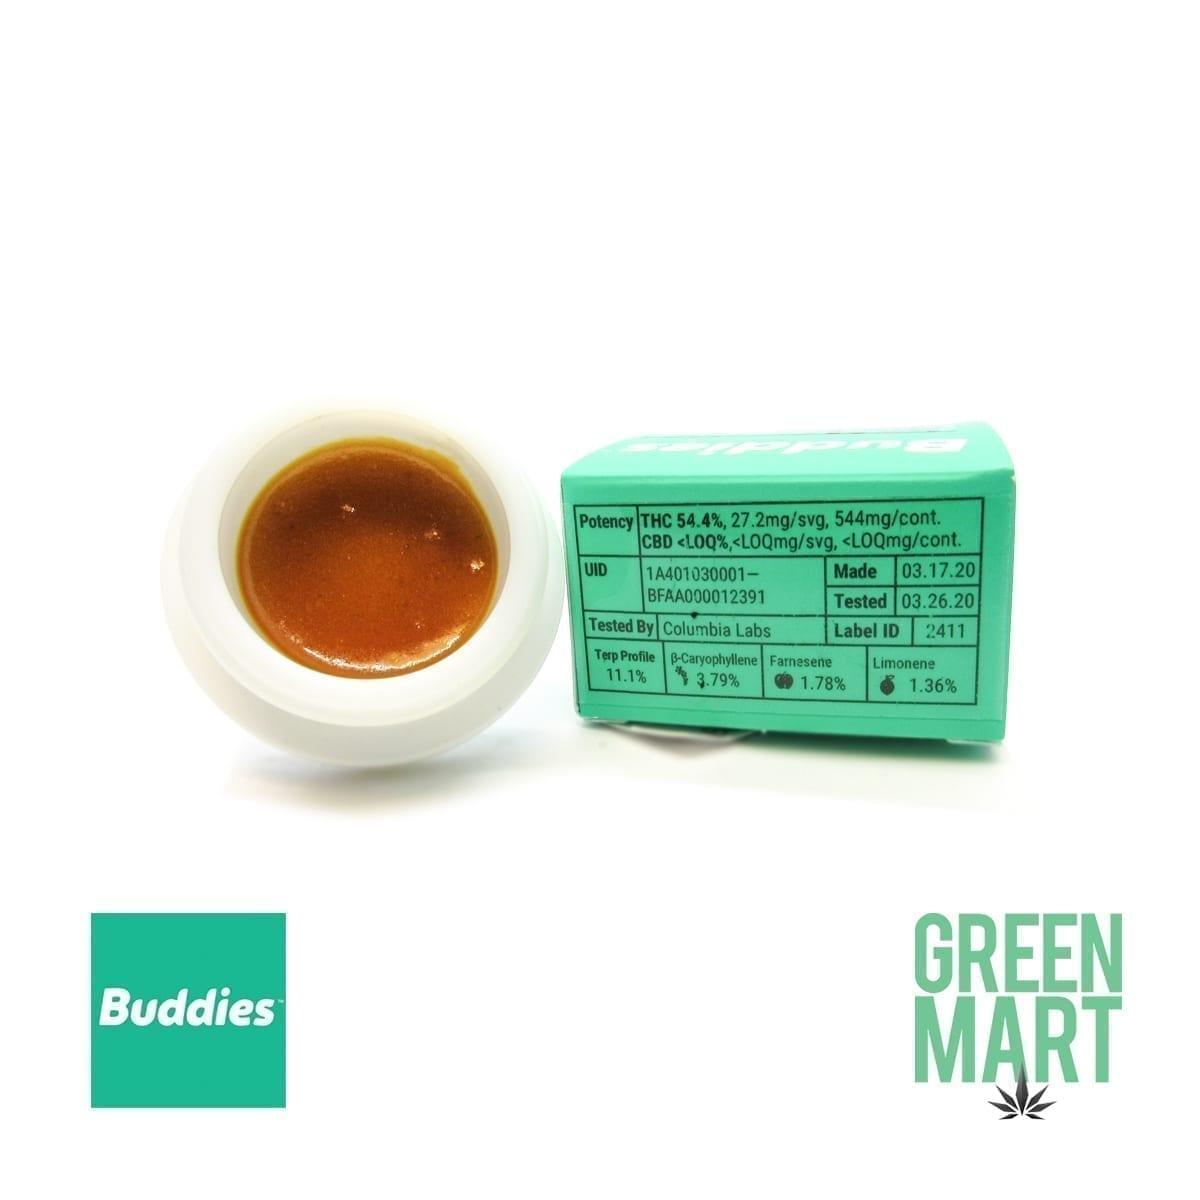 Buddies Dab - Sour OG X Gorilla Berry